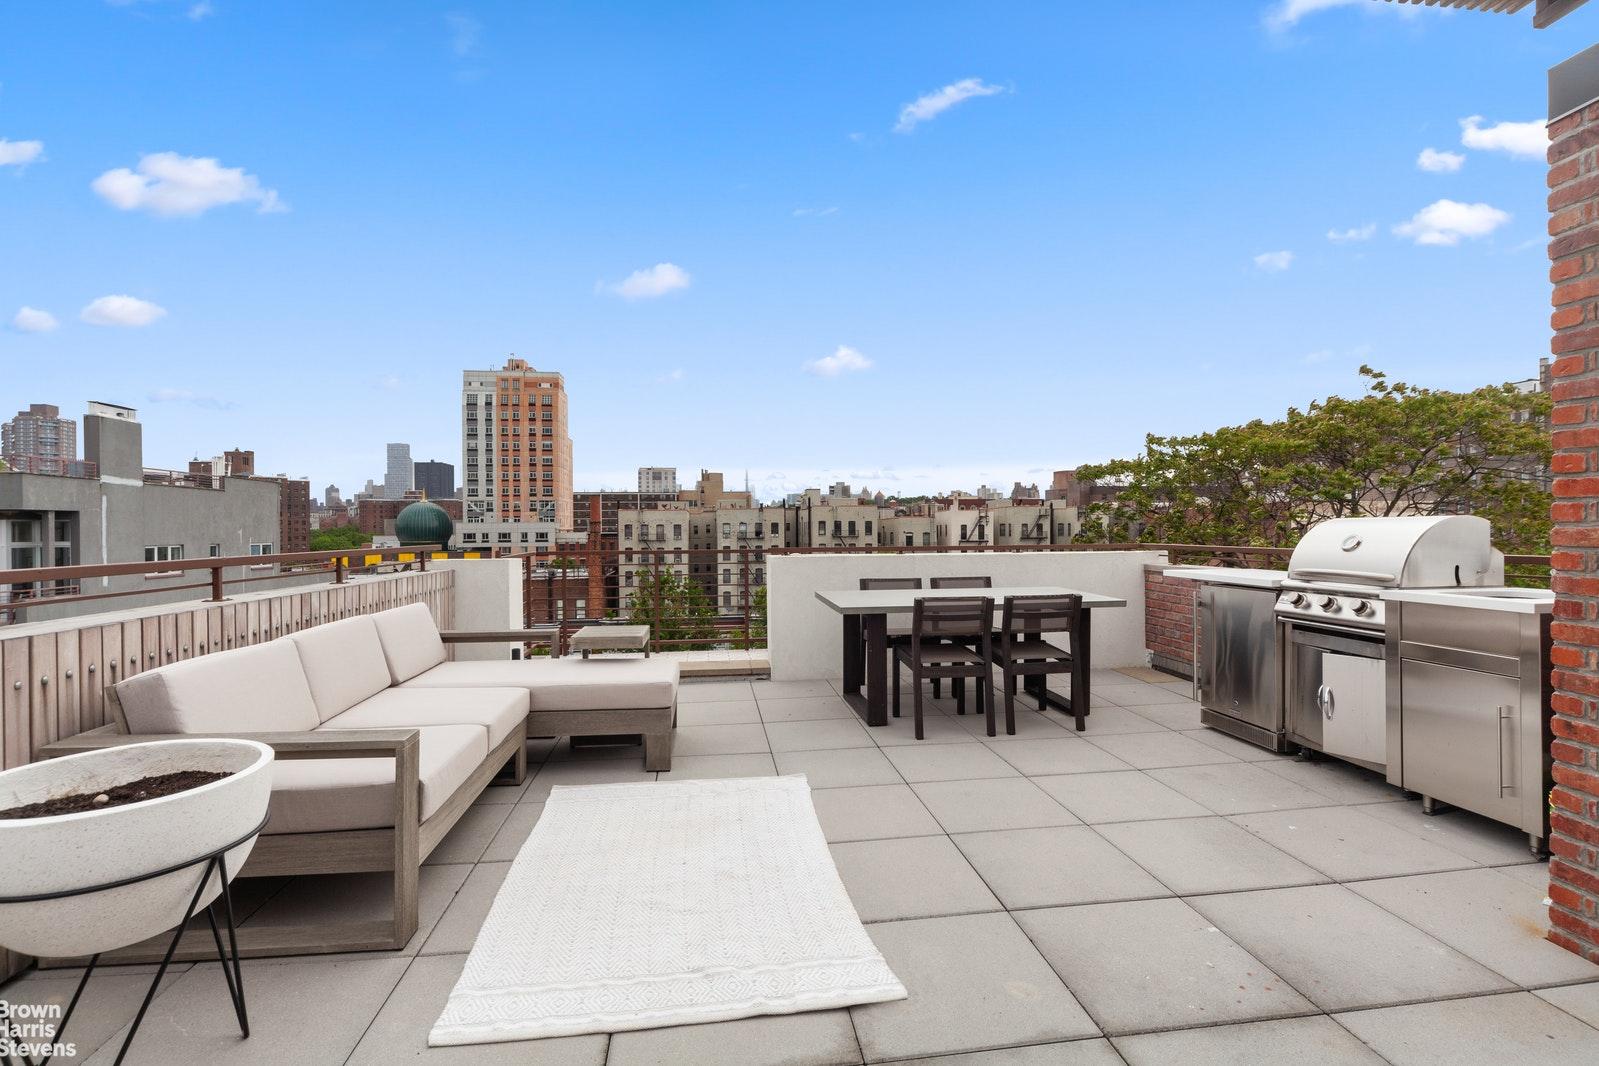 120 WEST 118TH STREET, Harlem, $1,695,000, Web #: 20186826